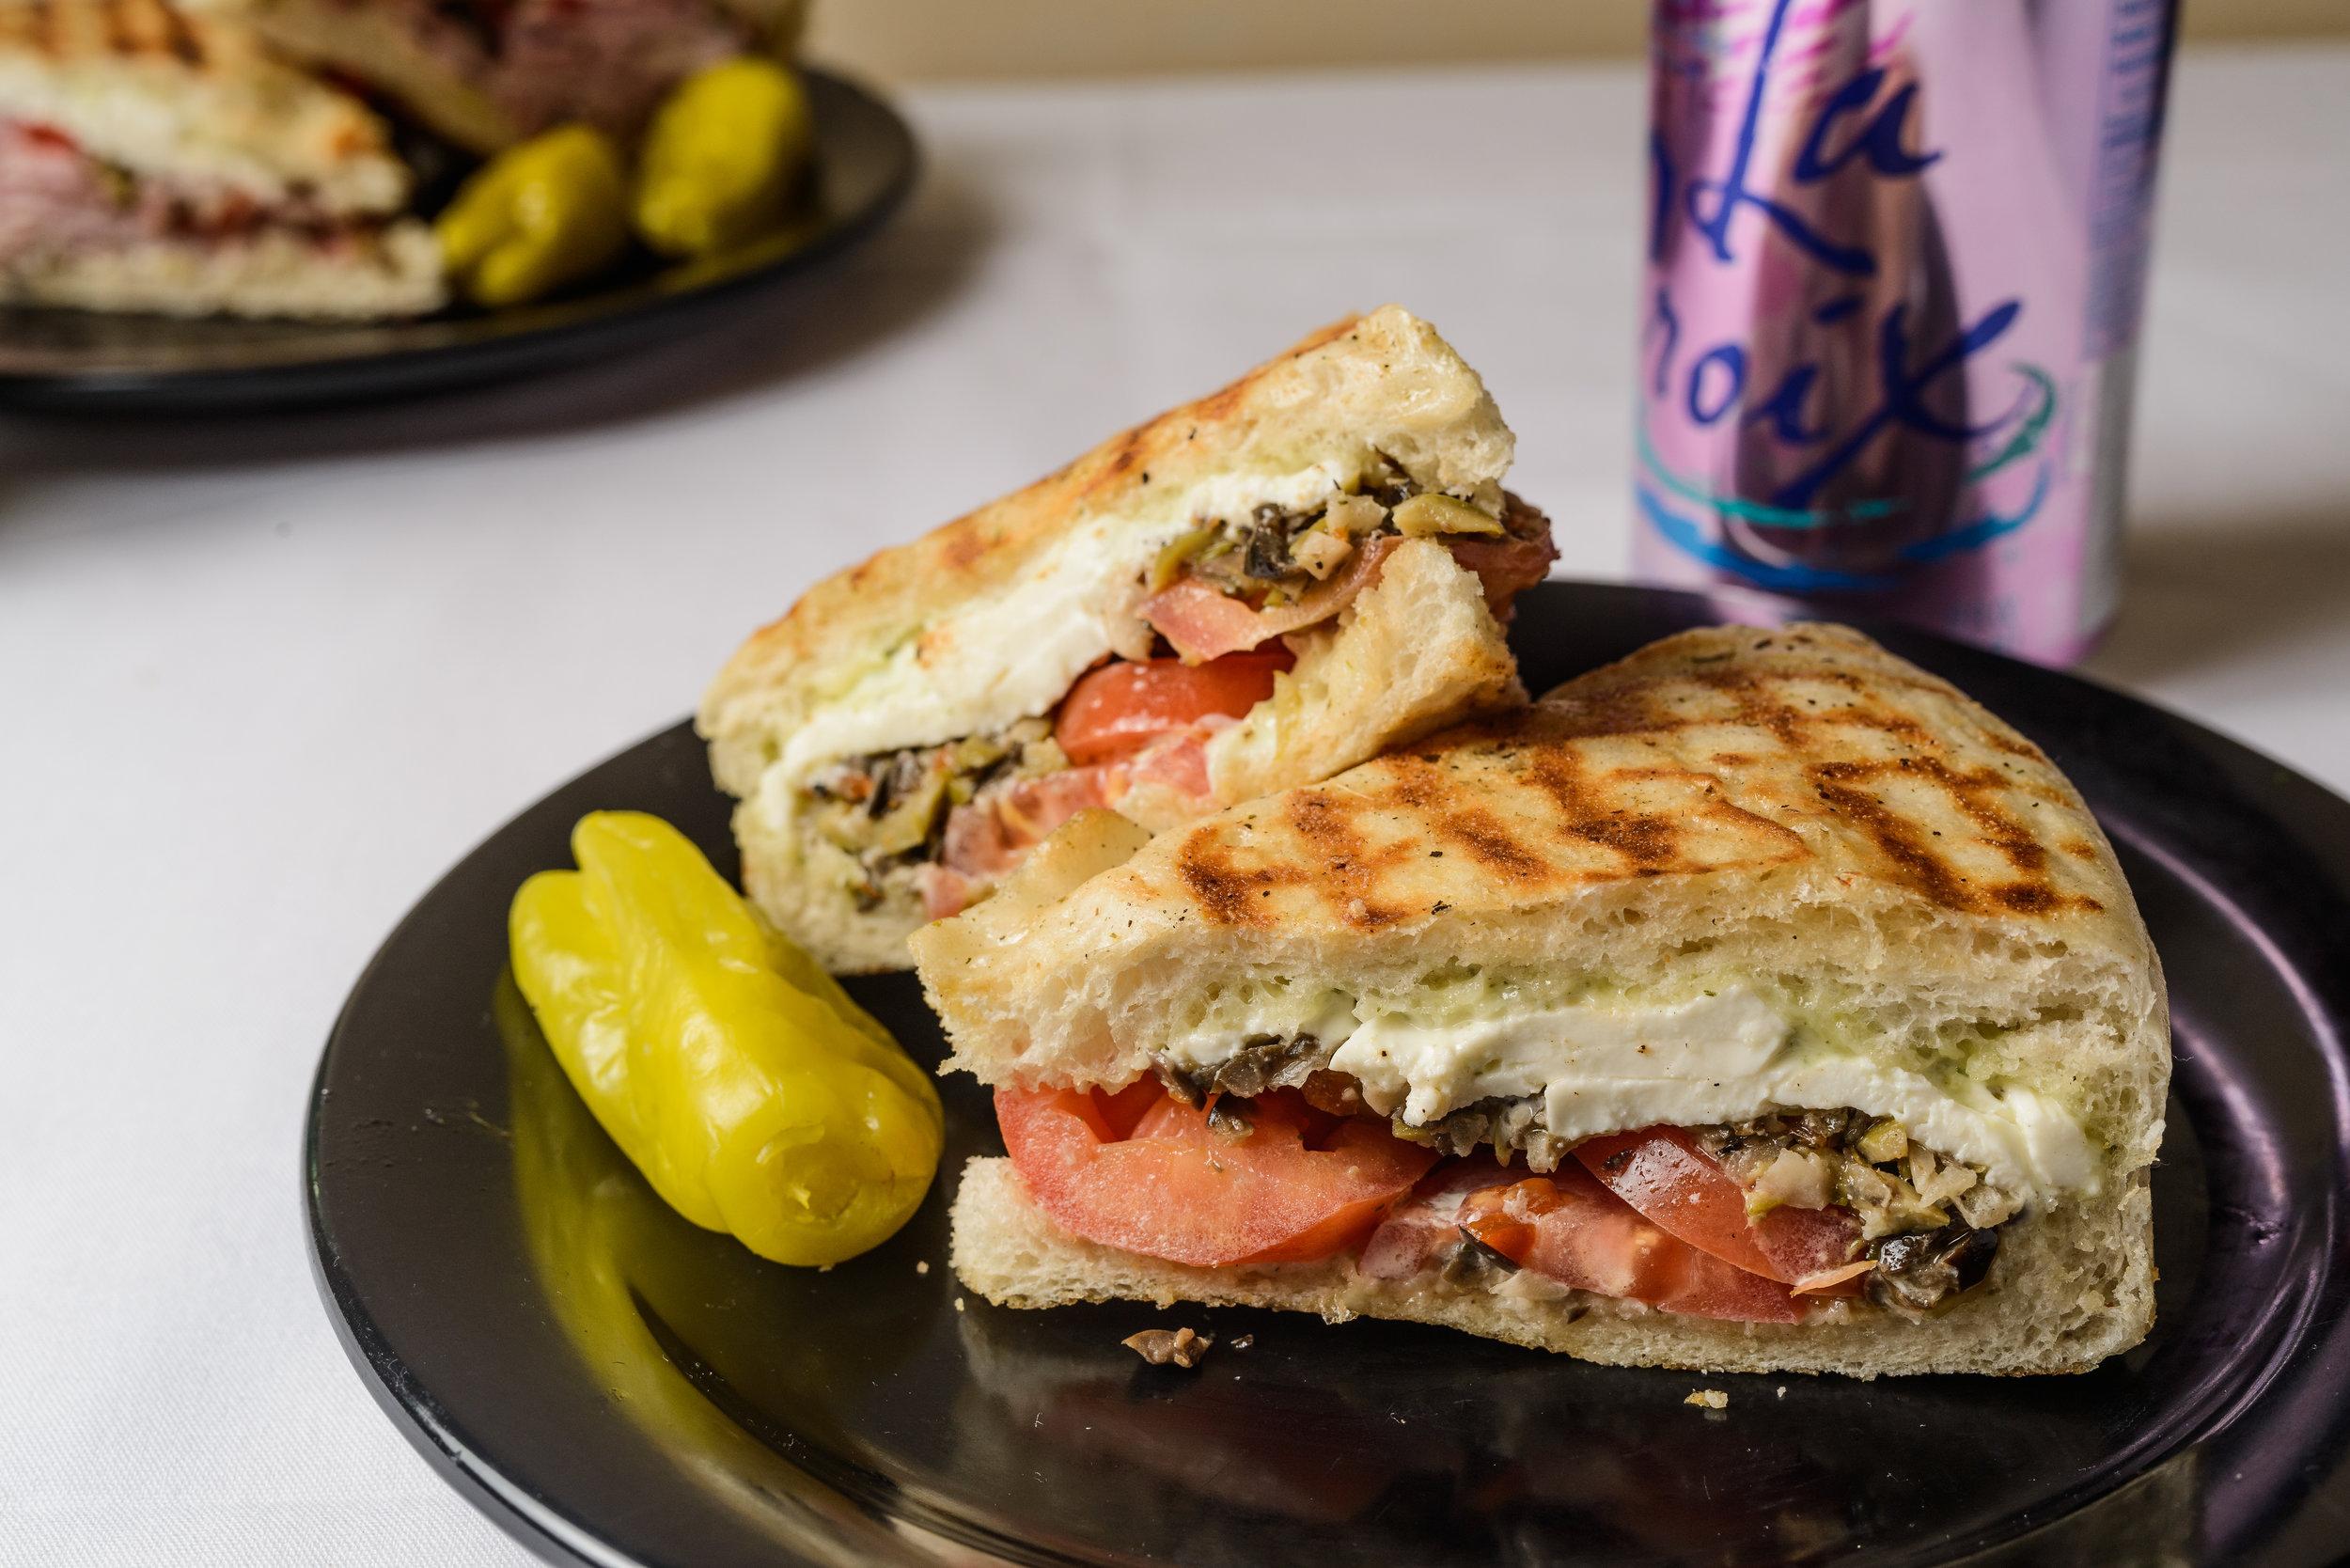 #7 - $7.00 - The Veggie – Roma tomatoes, fresh mozzarella, olive salad and pesto mayo